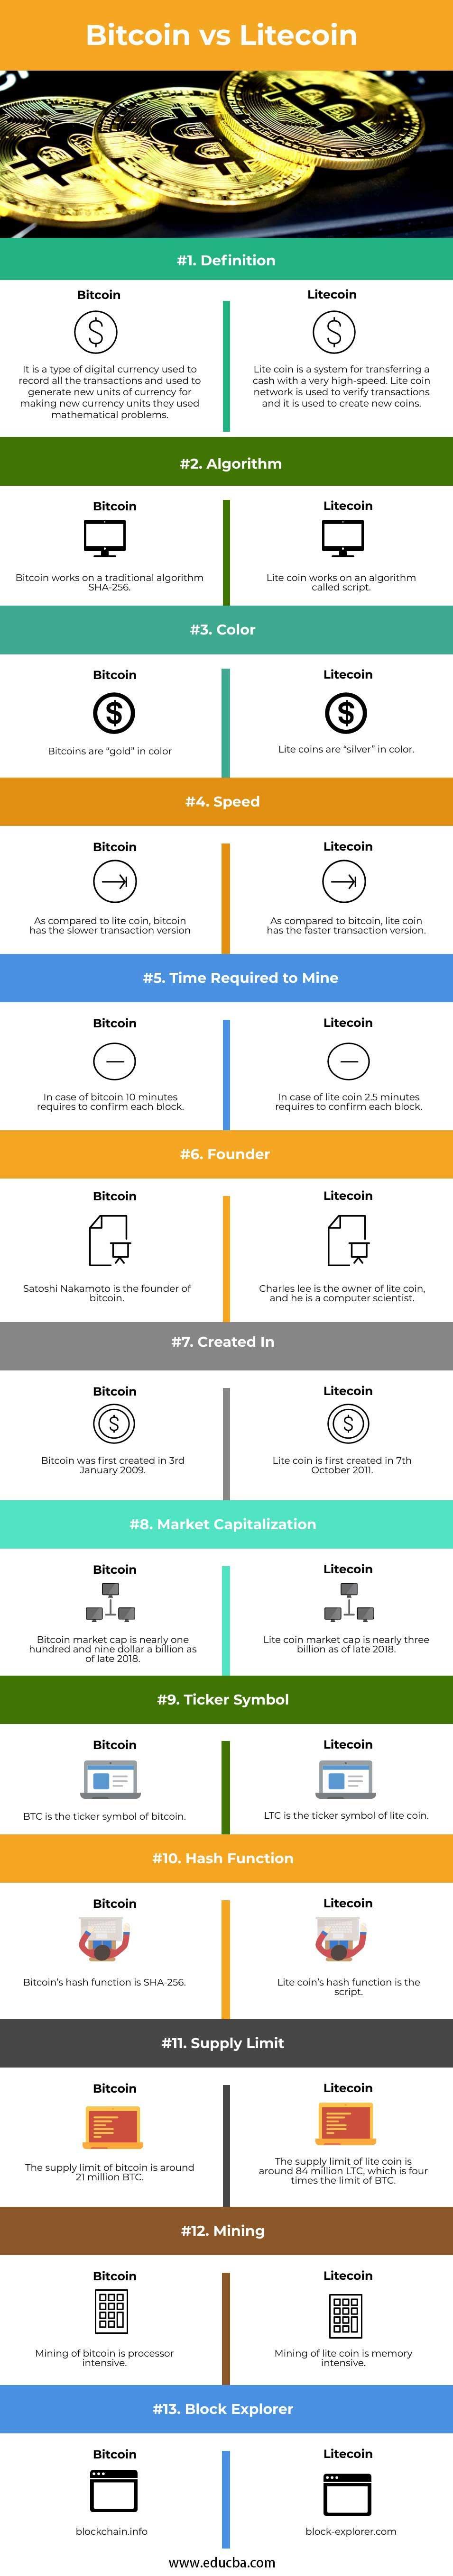 Bitcoin-vs-Litecoin-info